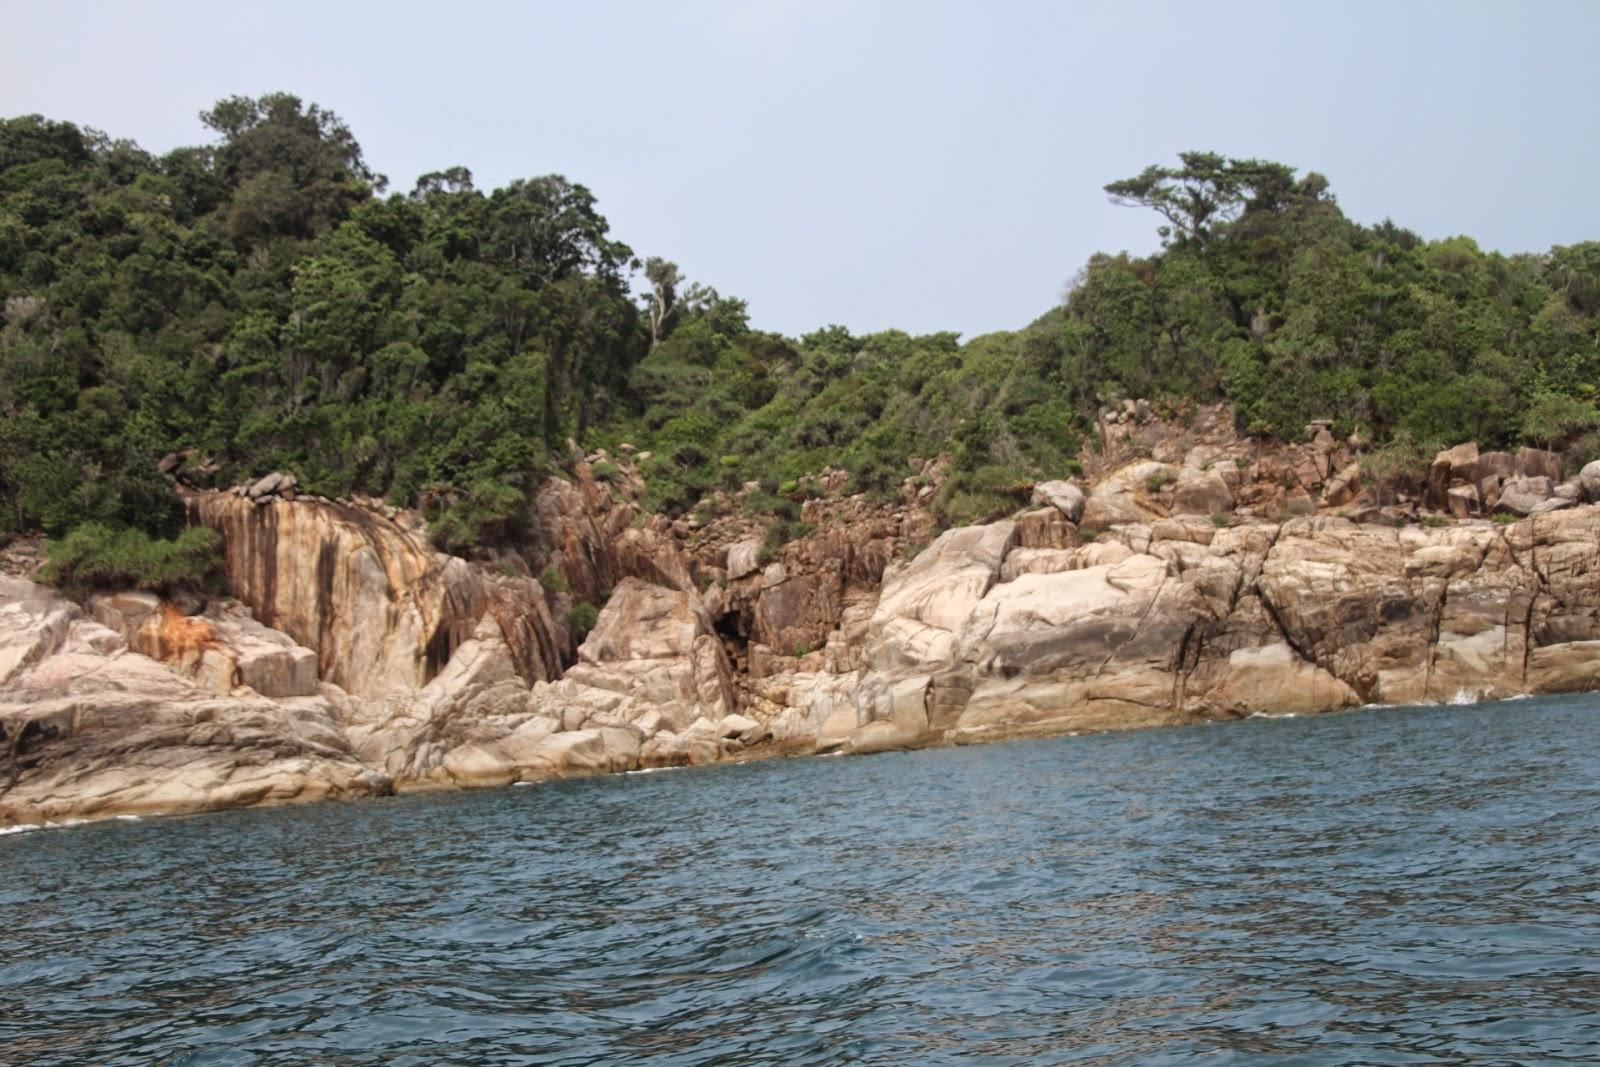 Pulau perhentian kecil moonlight